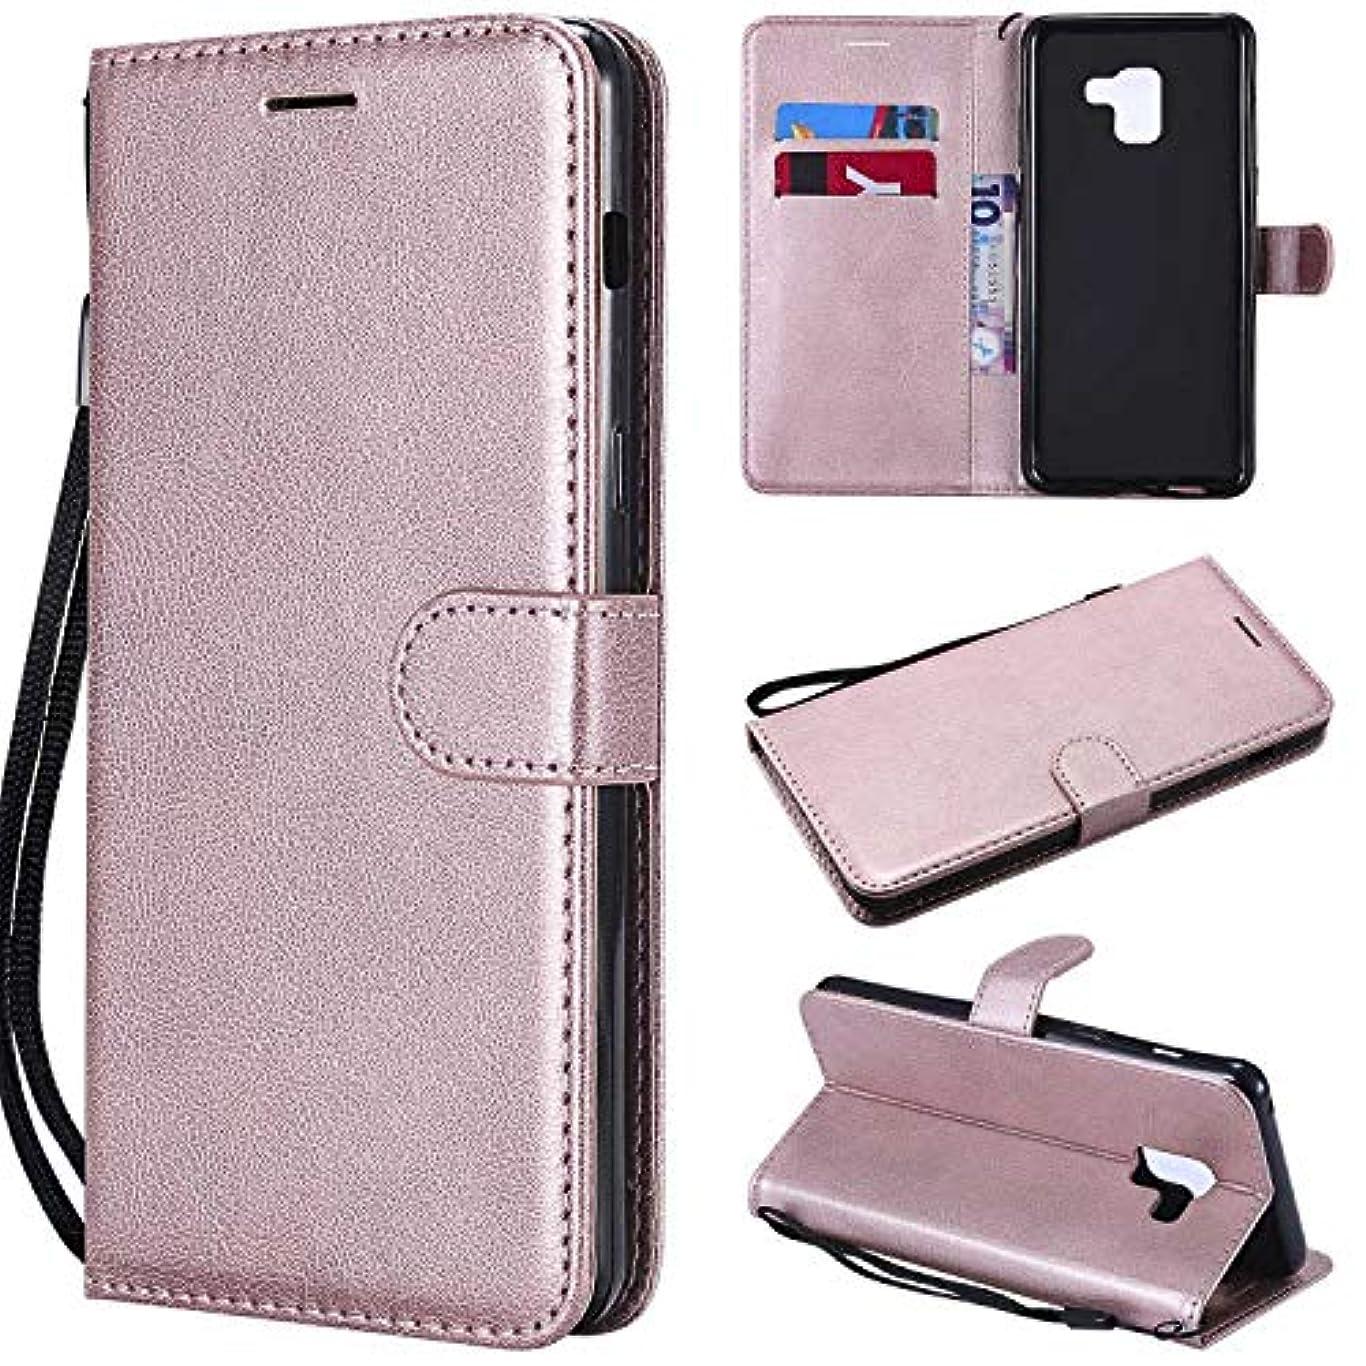 Galaxy A8 Plus ケース手帳型 OMATENTI レザー 革 薄型 手帳型カバー カード入れ スタンド機能 サムスン Galaxy A8 Plus おしゃれ 手帳ケース (4-ローズゴールド)